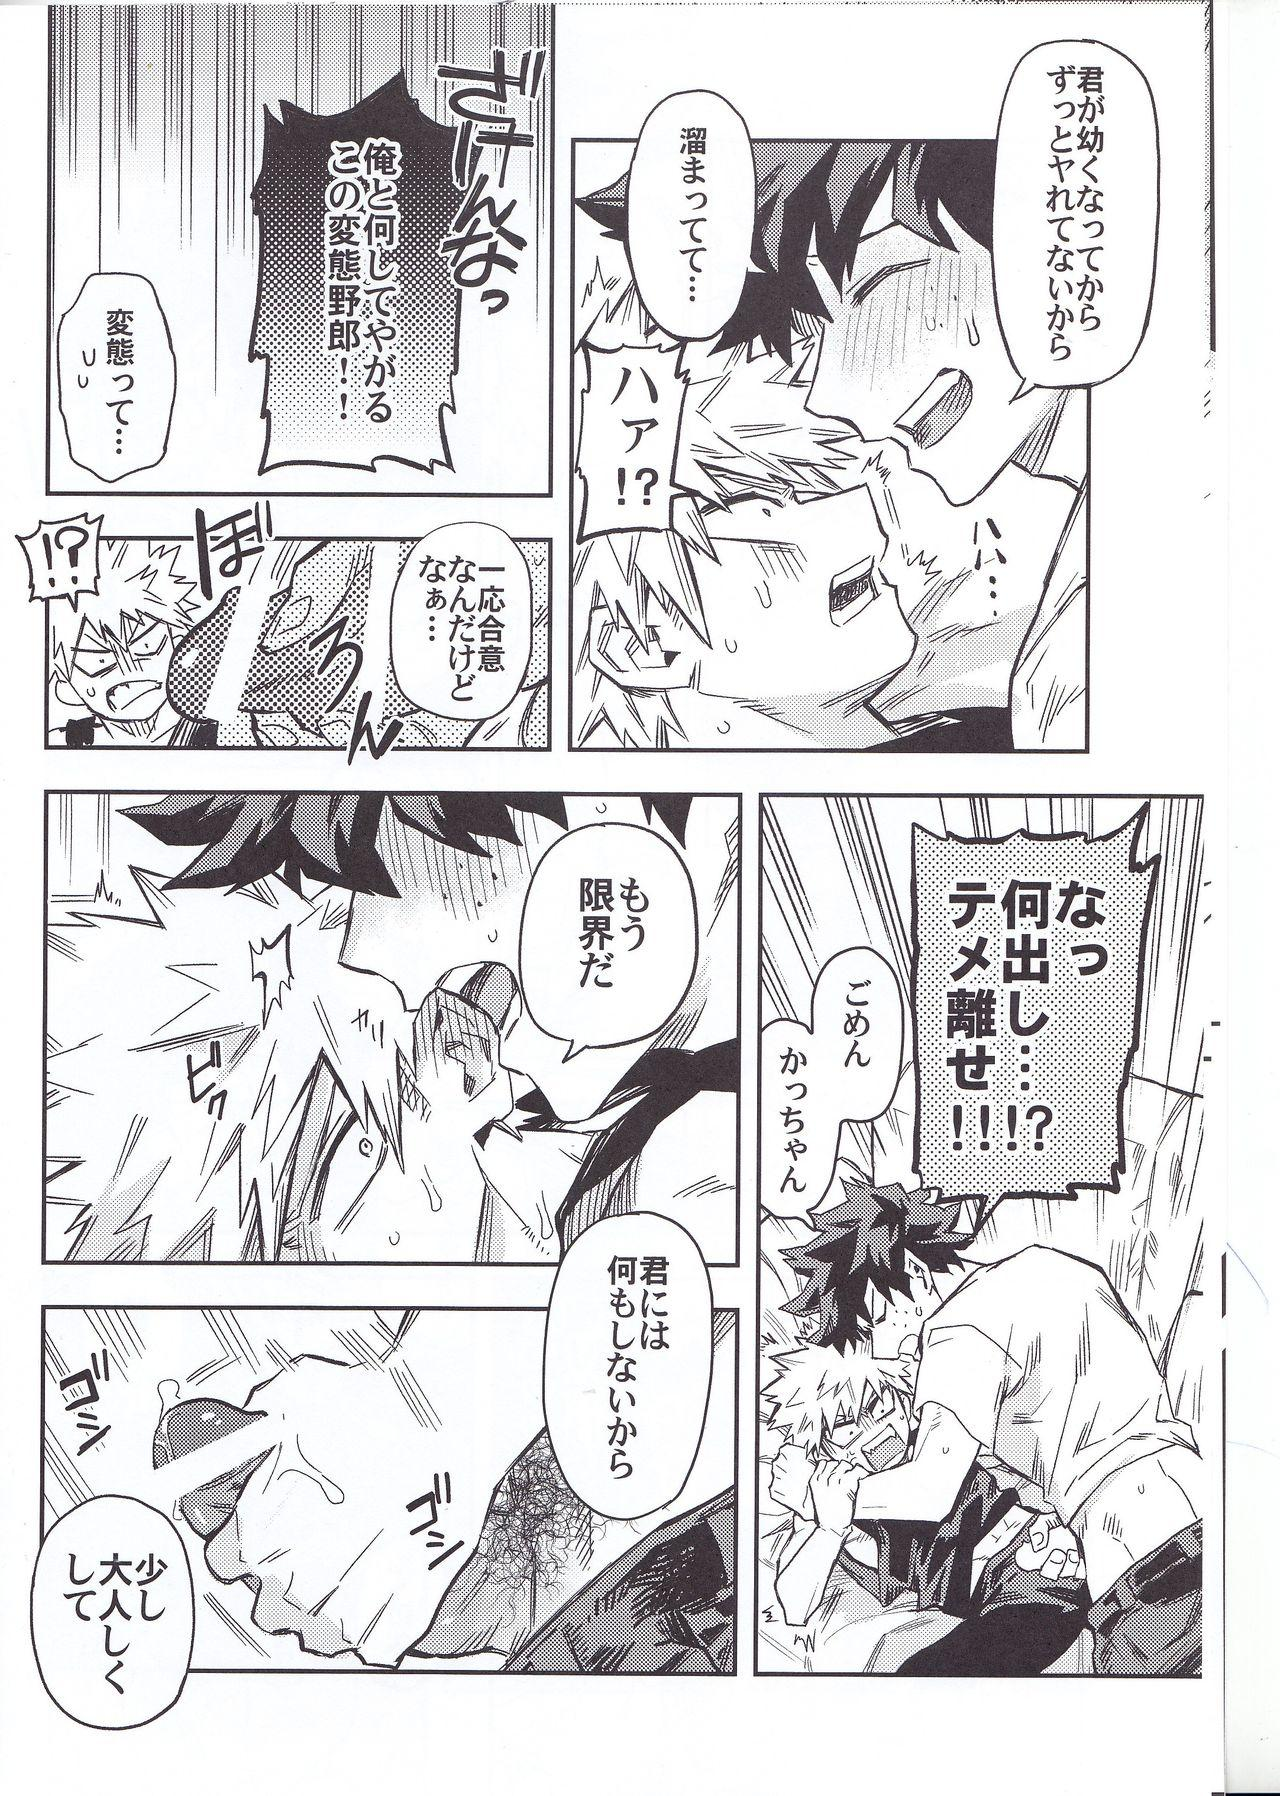 Kuchiguruma ni wa Goyoushin 6